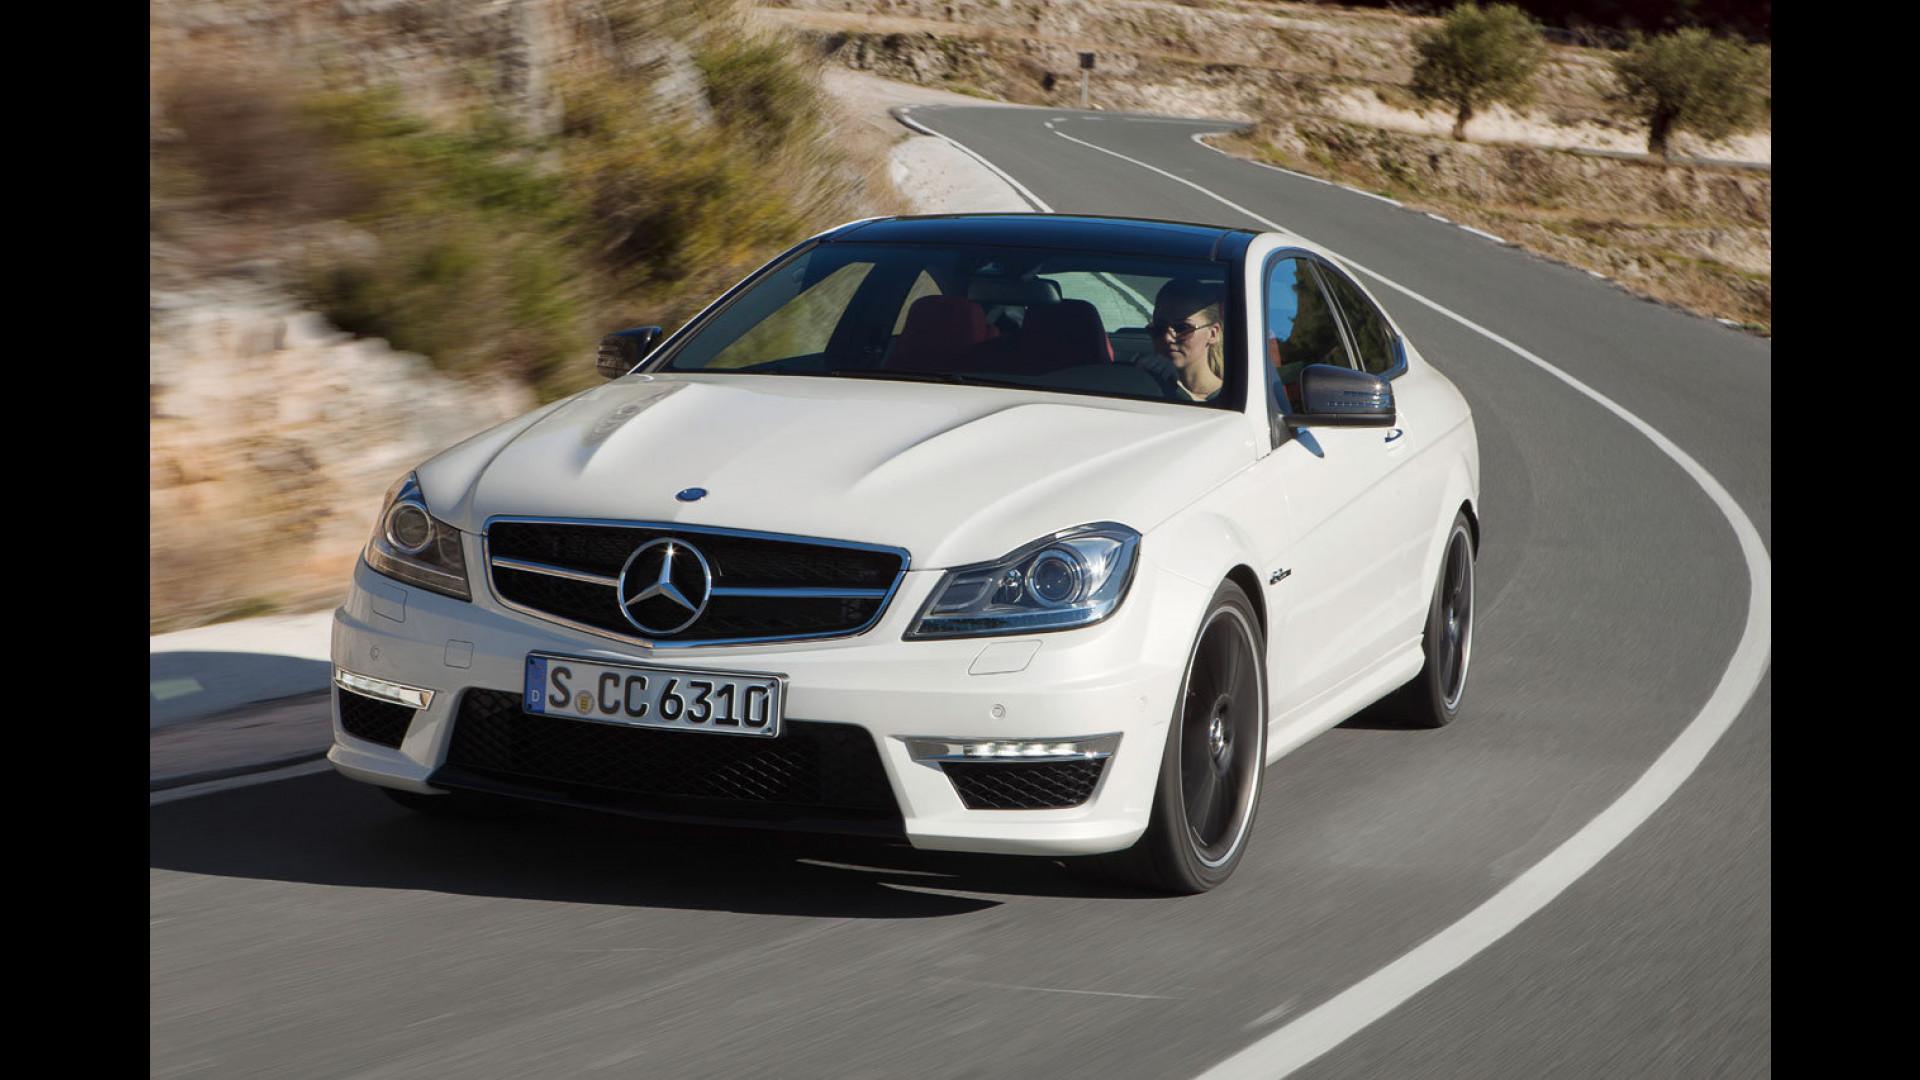 Schemi Elettrici Mercedes : Mercedes classe c coupé